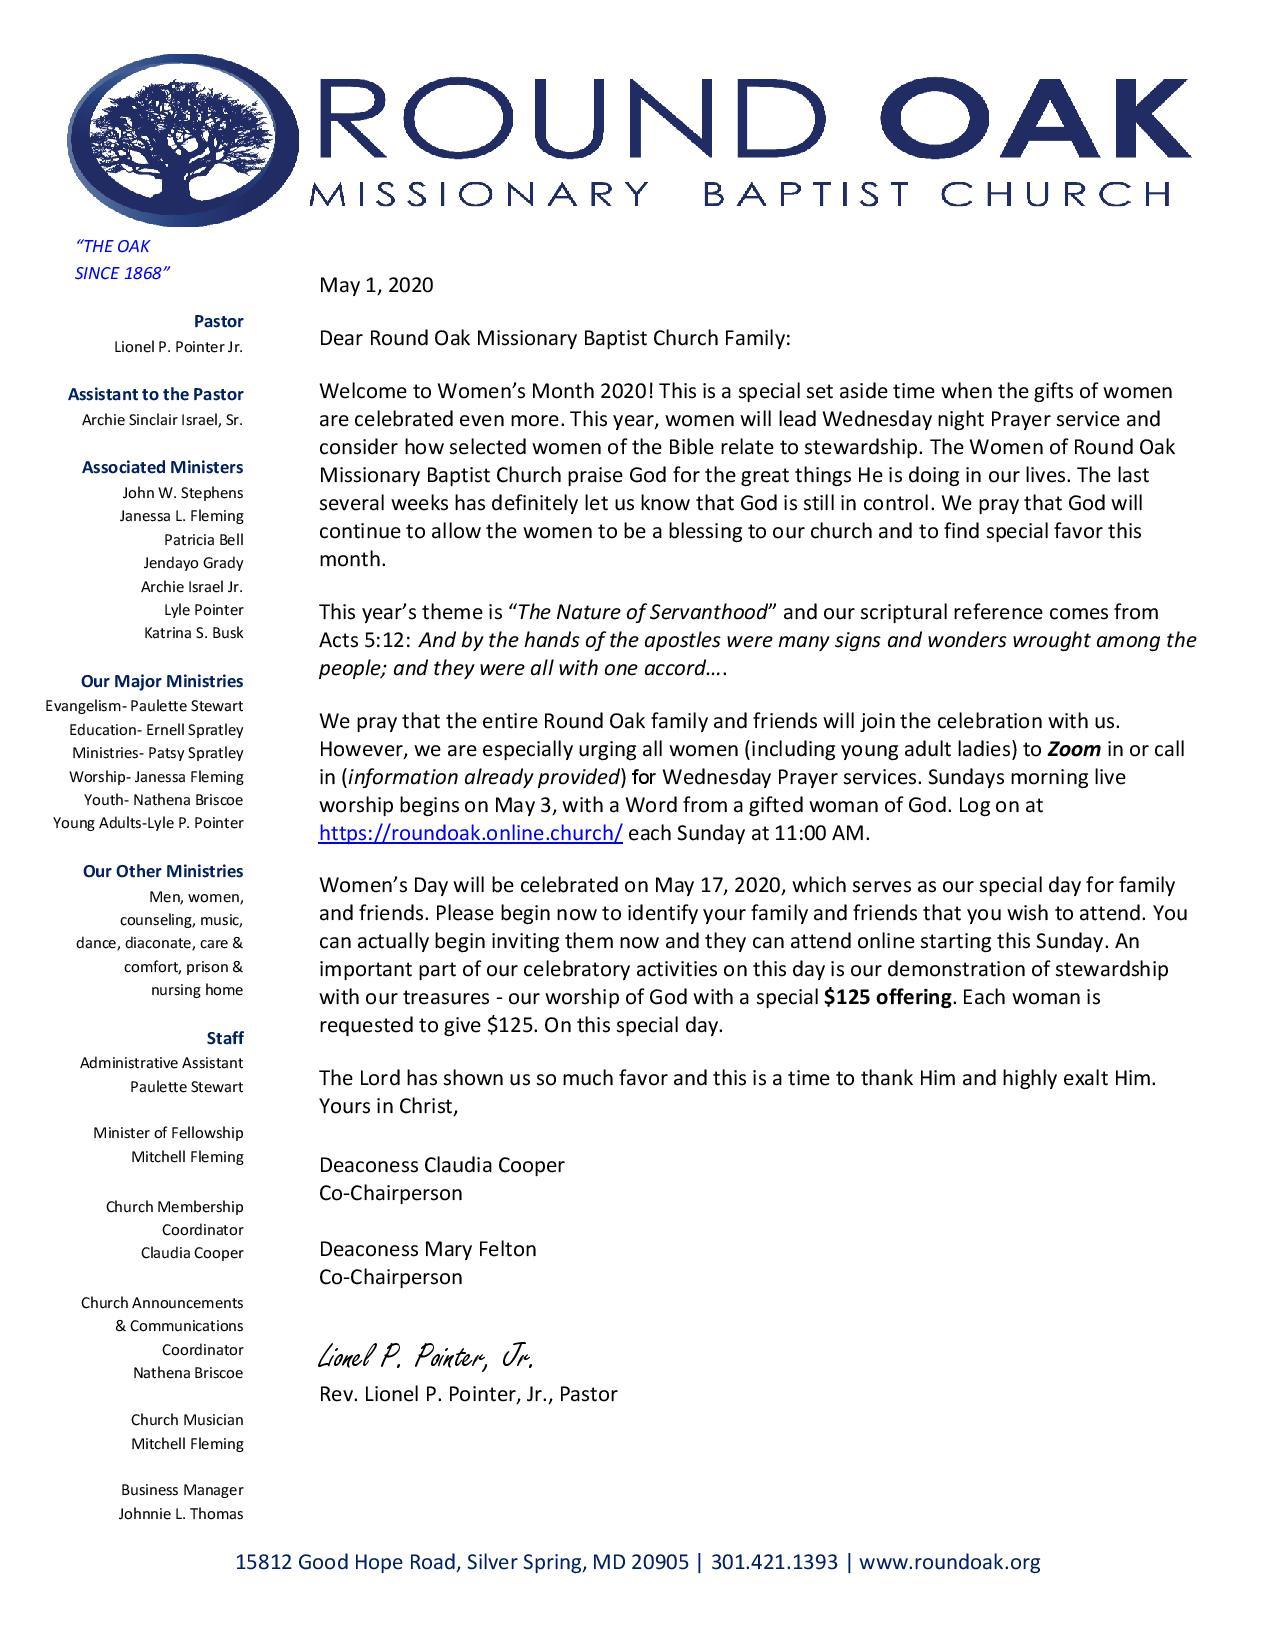 RO Women s Month Letter 2020